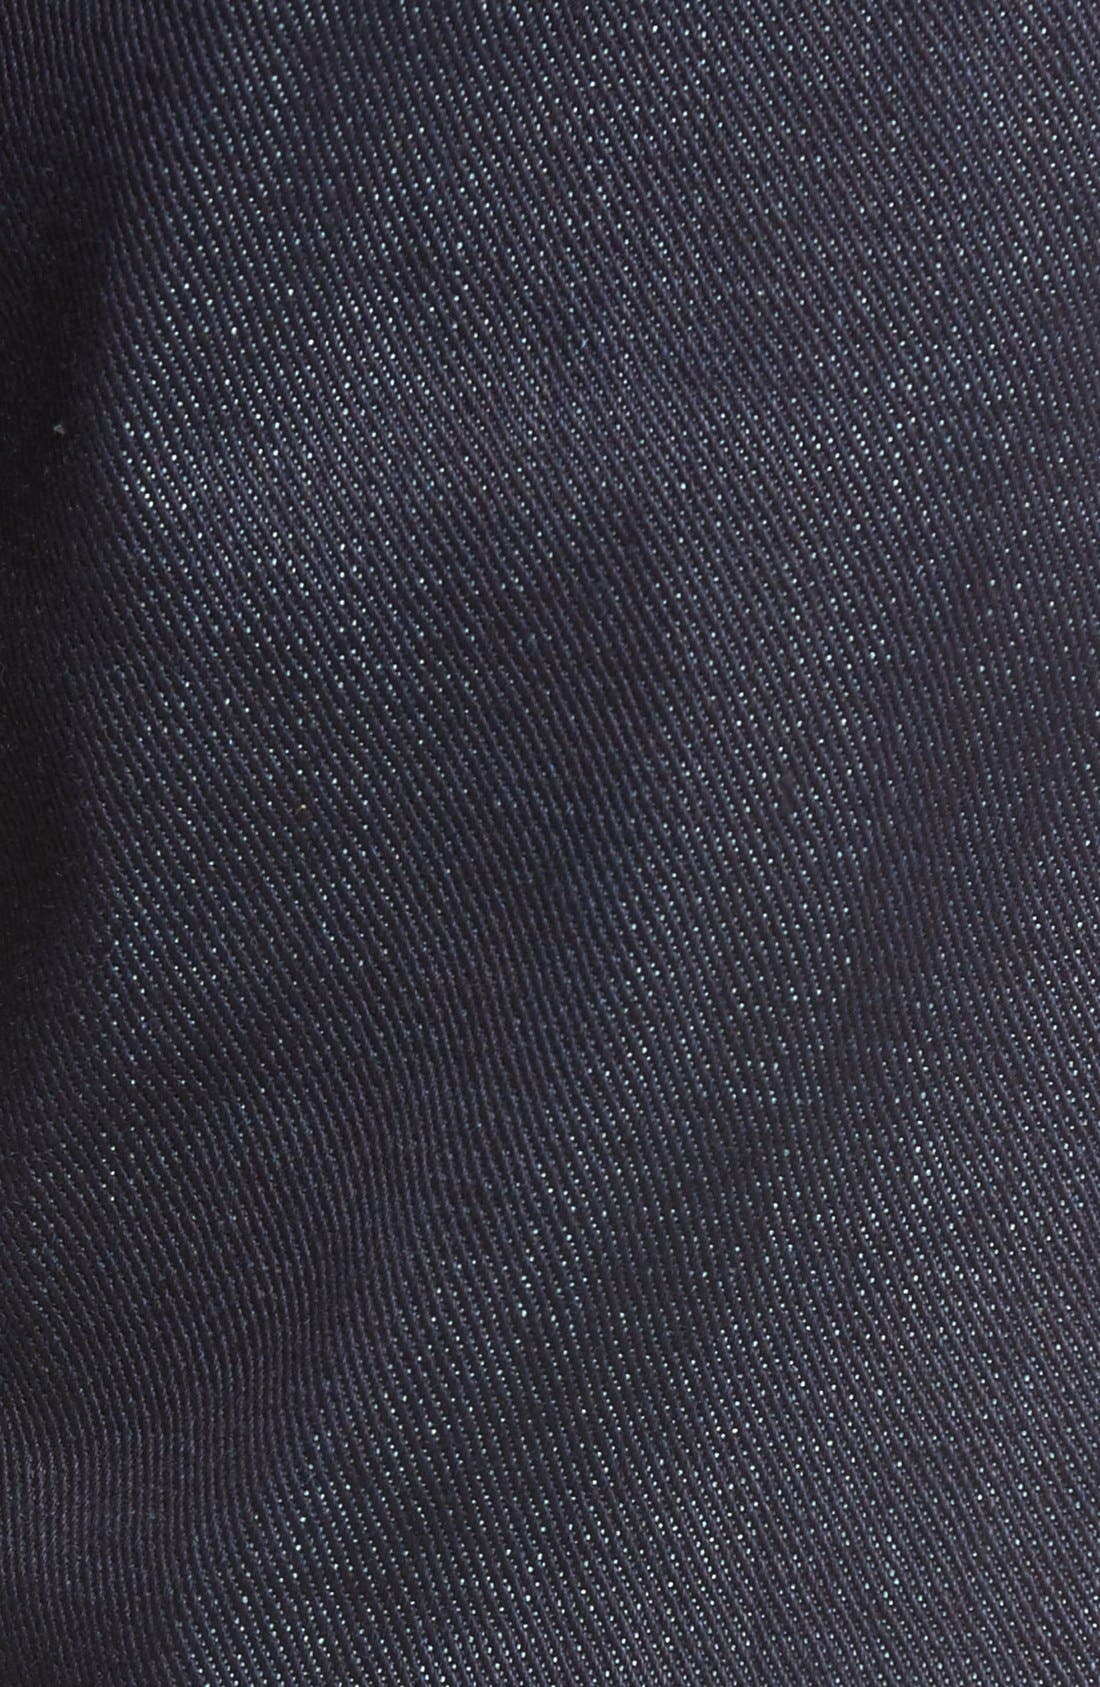 UB121 Selvedge Skinny Fit Jeans,                             Alternate thumbnail 5, color,                             401